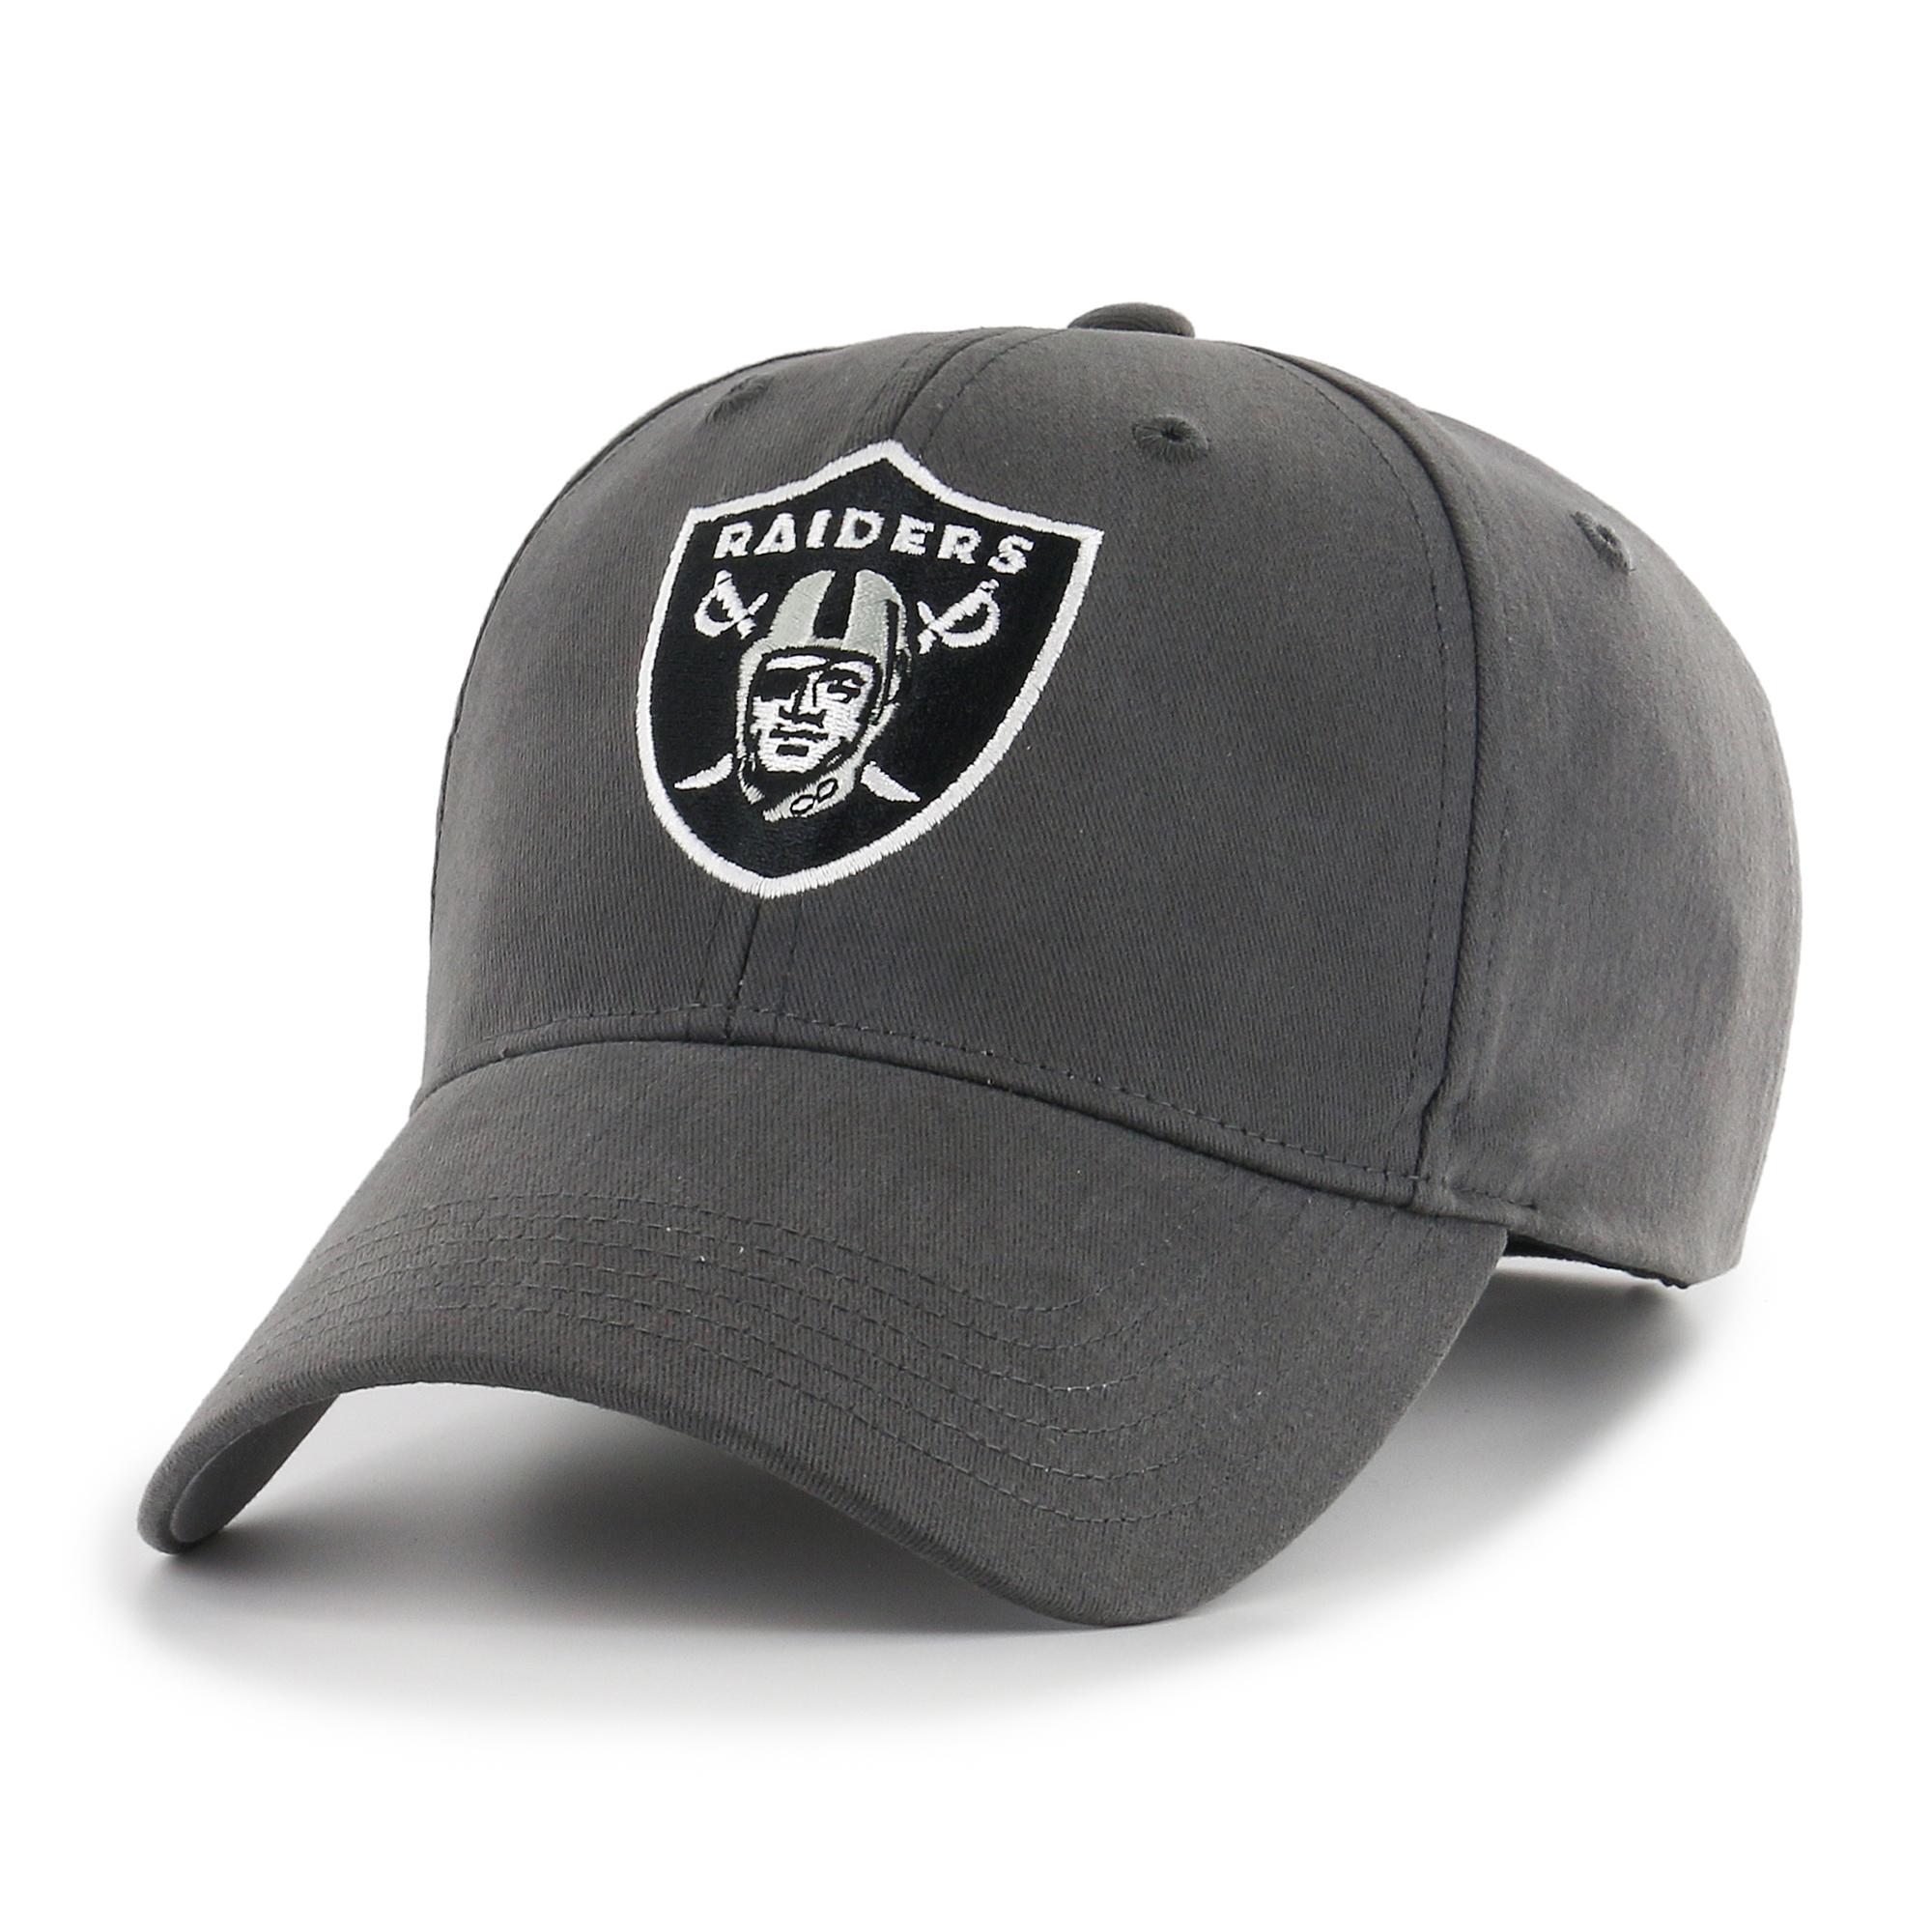 NFL Oakland Raiders Basic Adjustable Cap/Hat by Fan Favorite